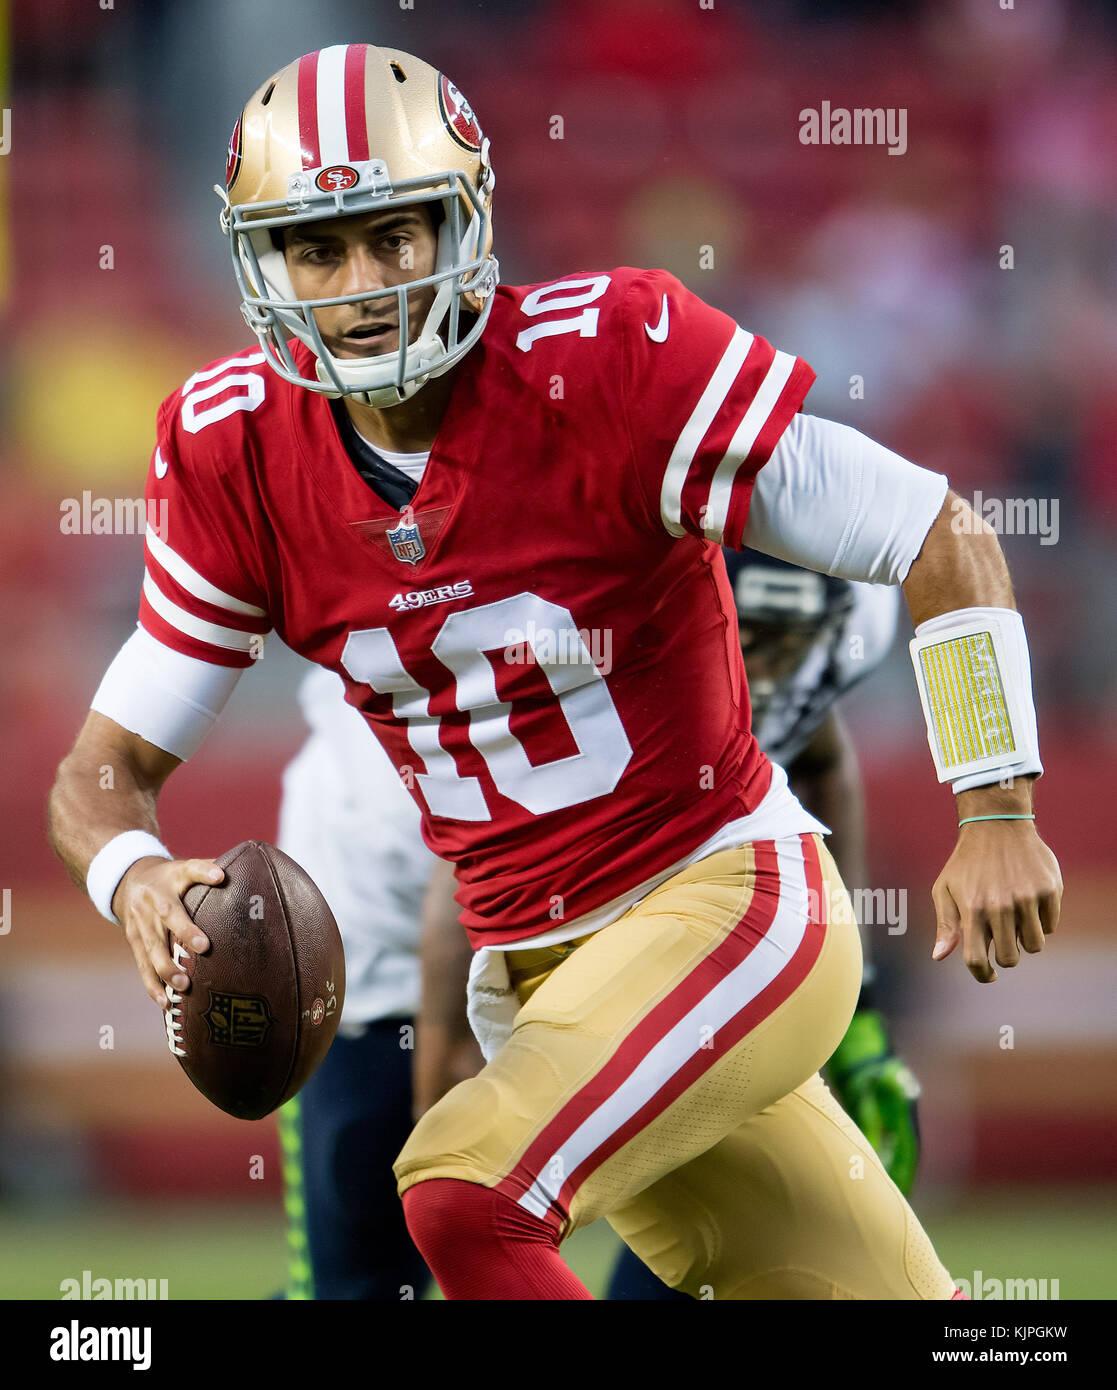 Santa Clara, California, USA. 26th Nov, 2017. San Francisco 49ers quarterback Jimmy Garoppolo (10) scrambles in - Stock Image